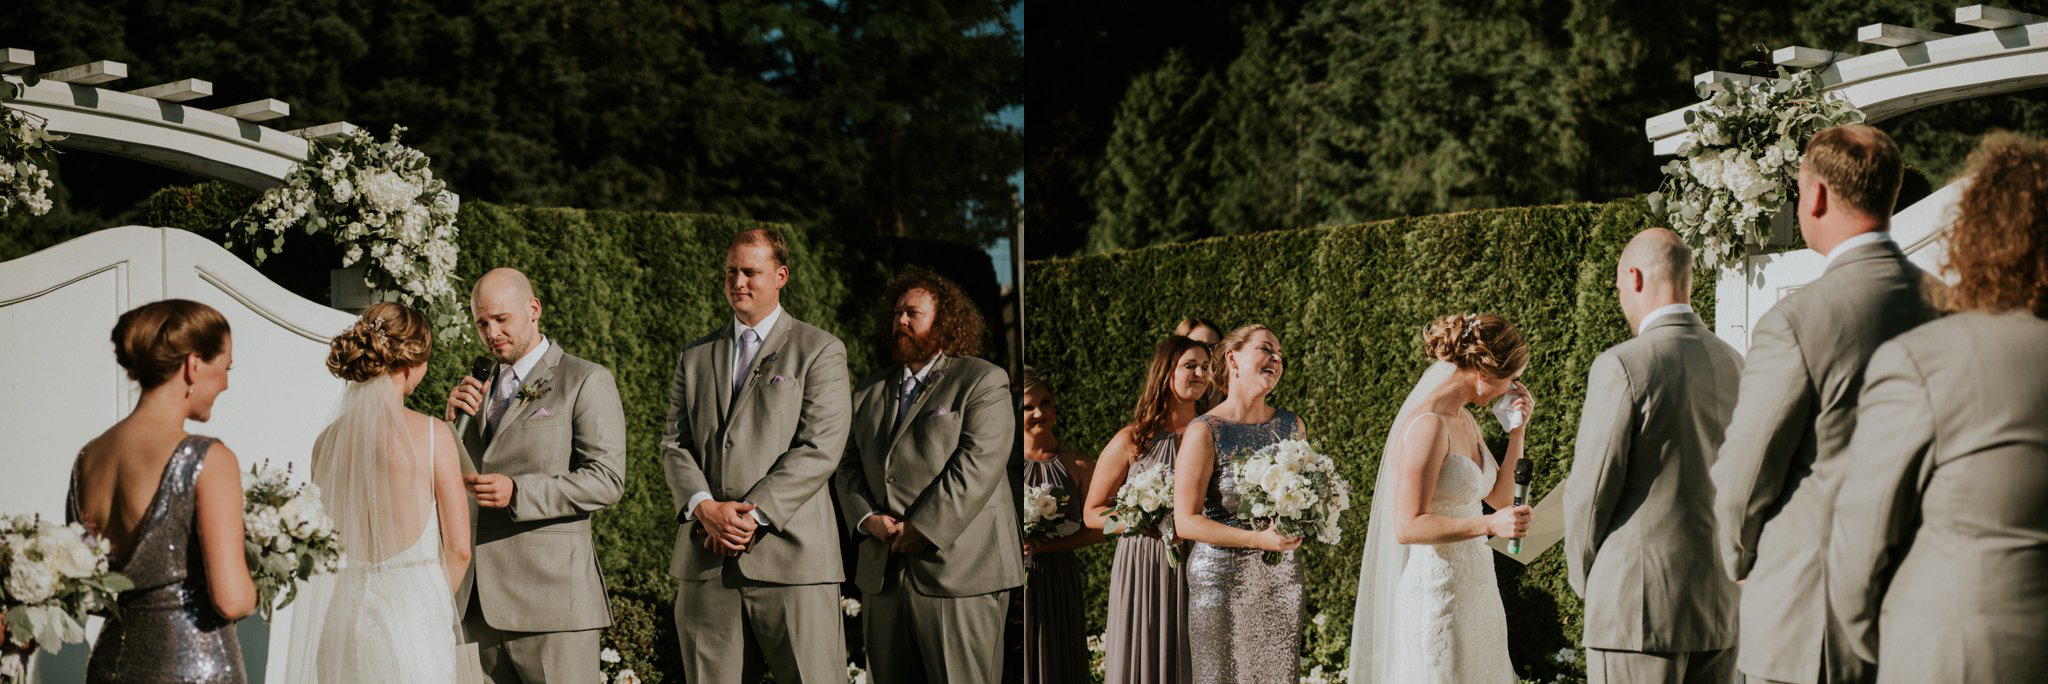 hollywood-school-house-wedding-seattle-photographer-caitlyn-nikula-79.jpg